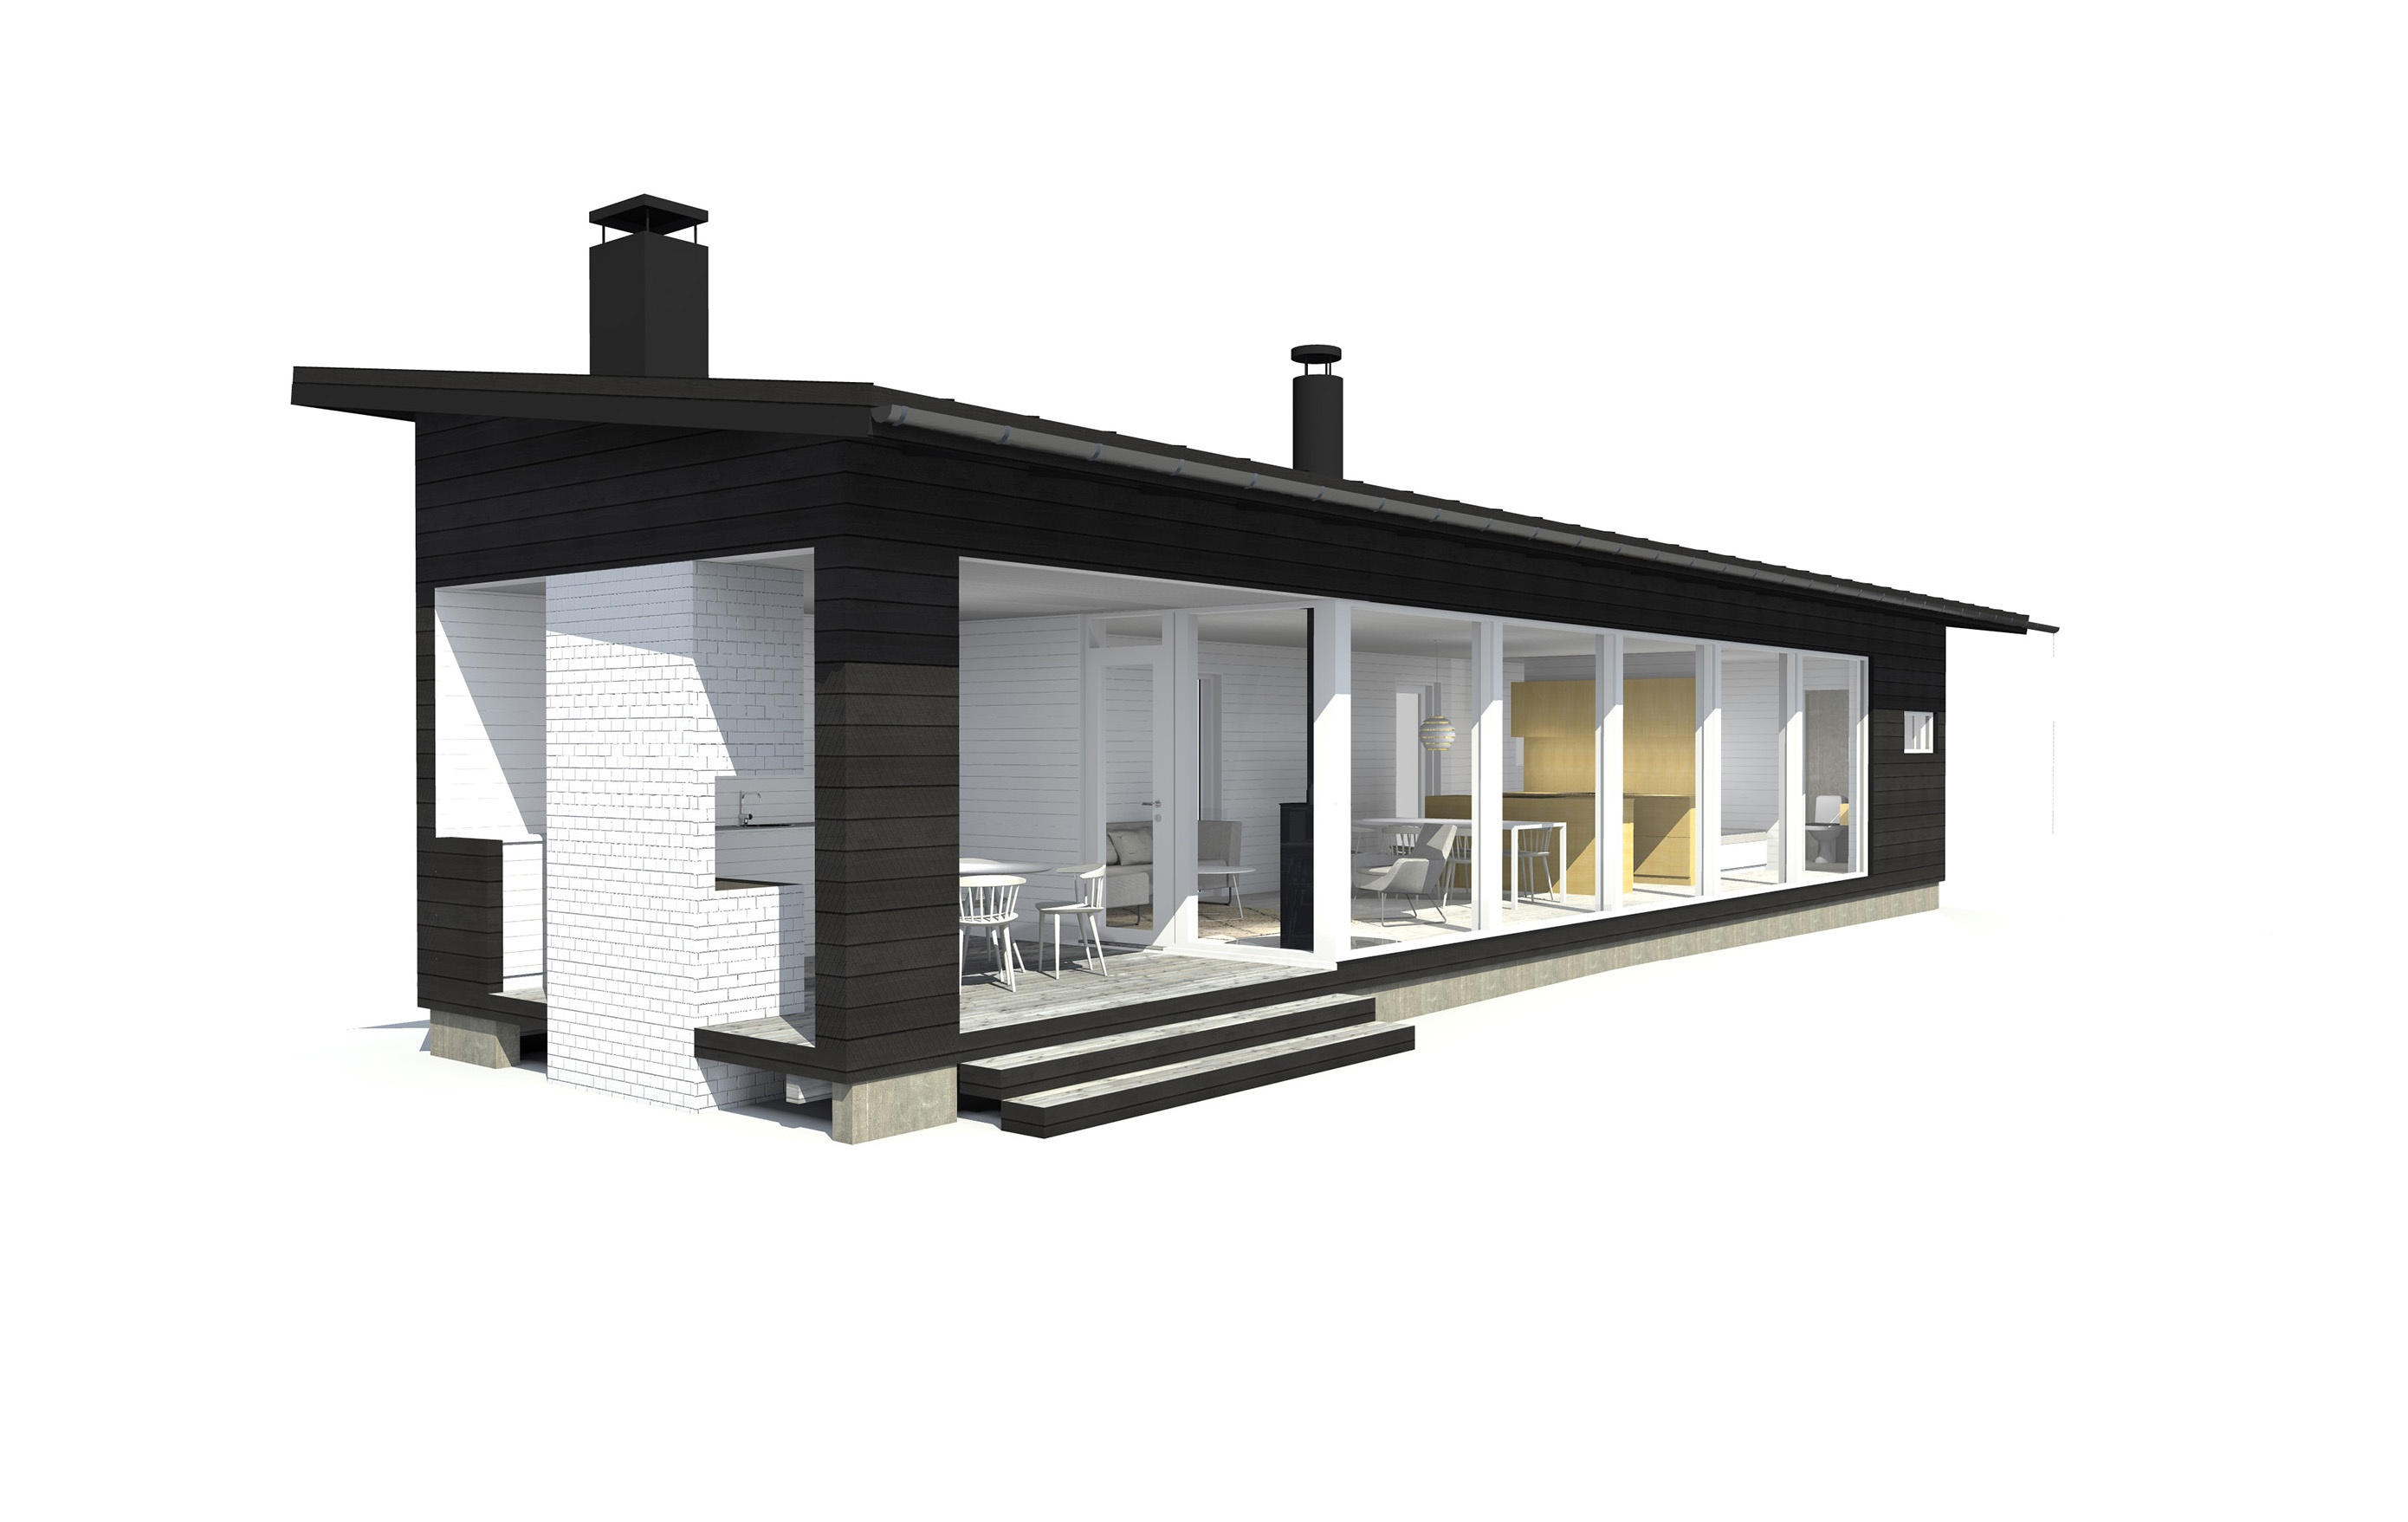 Sunhouse Linjakas talo S170_72ppi (2).jpg